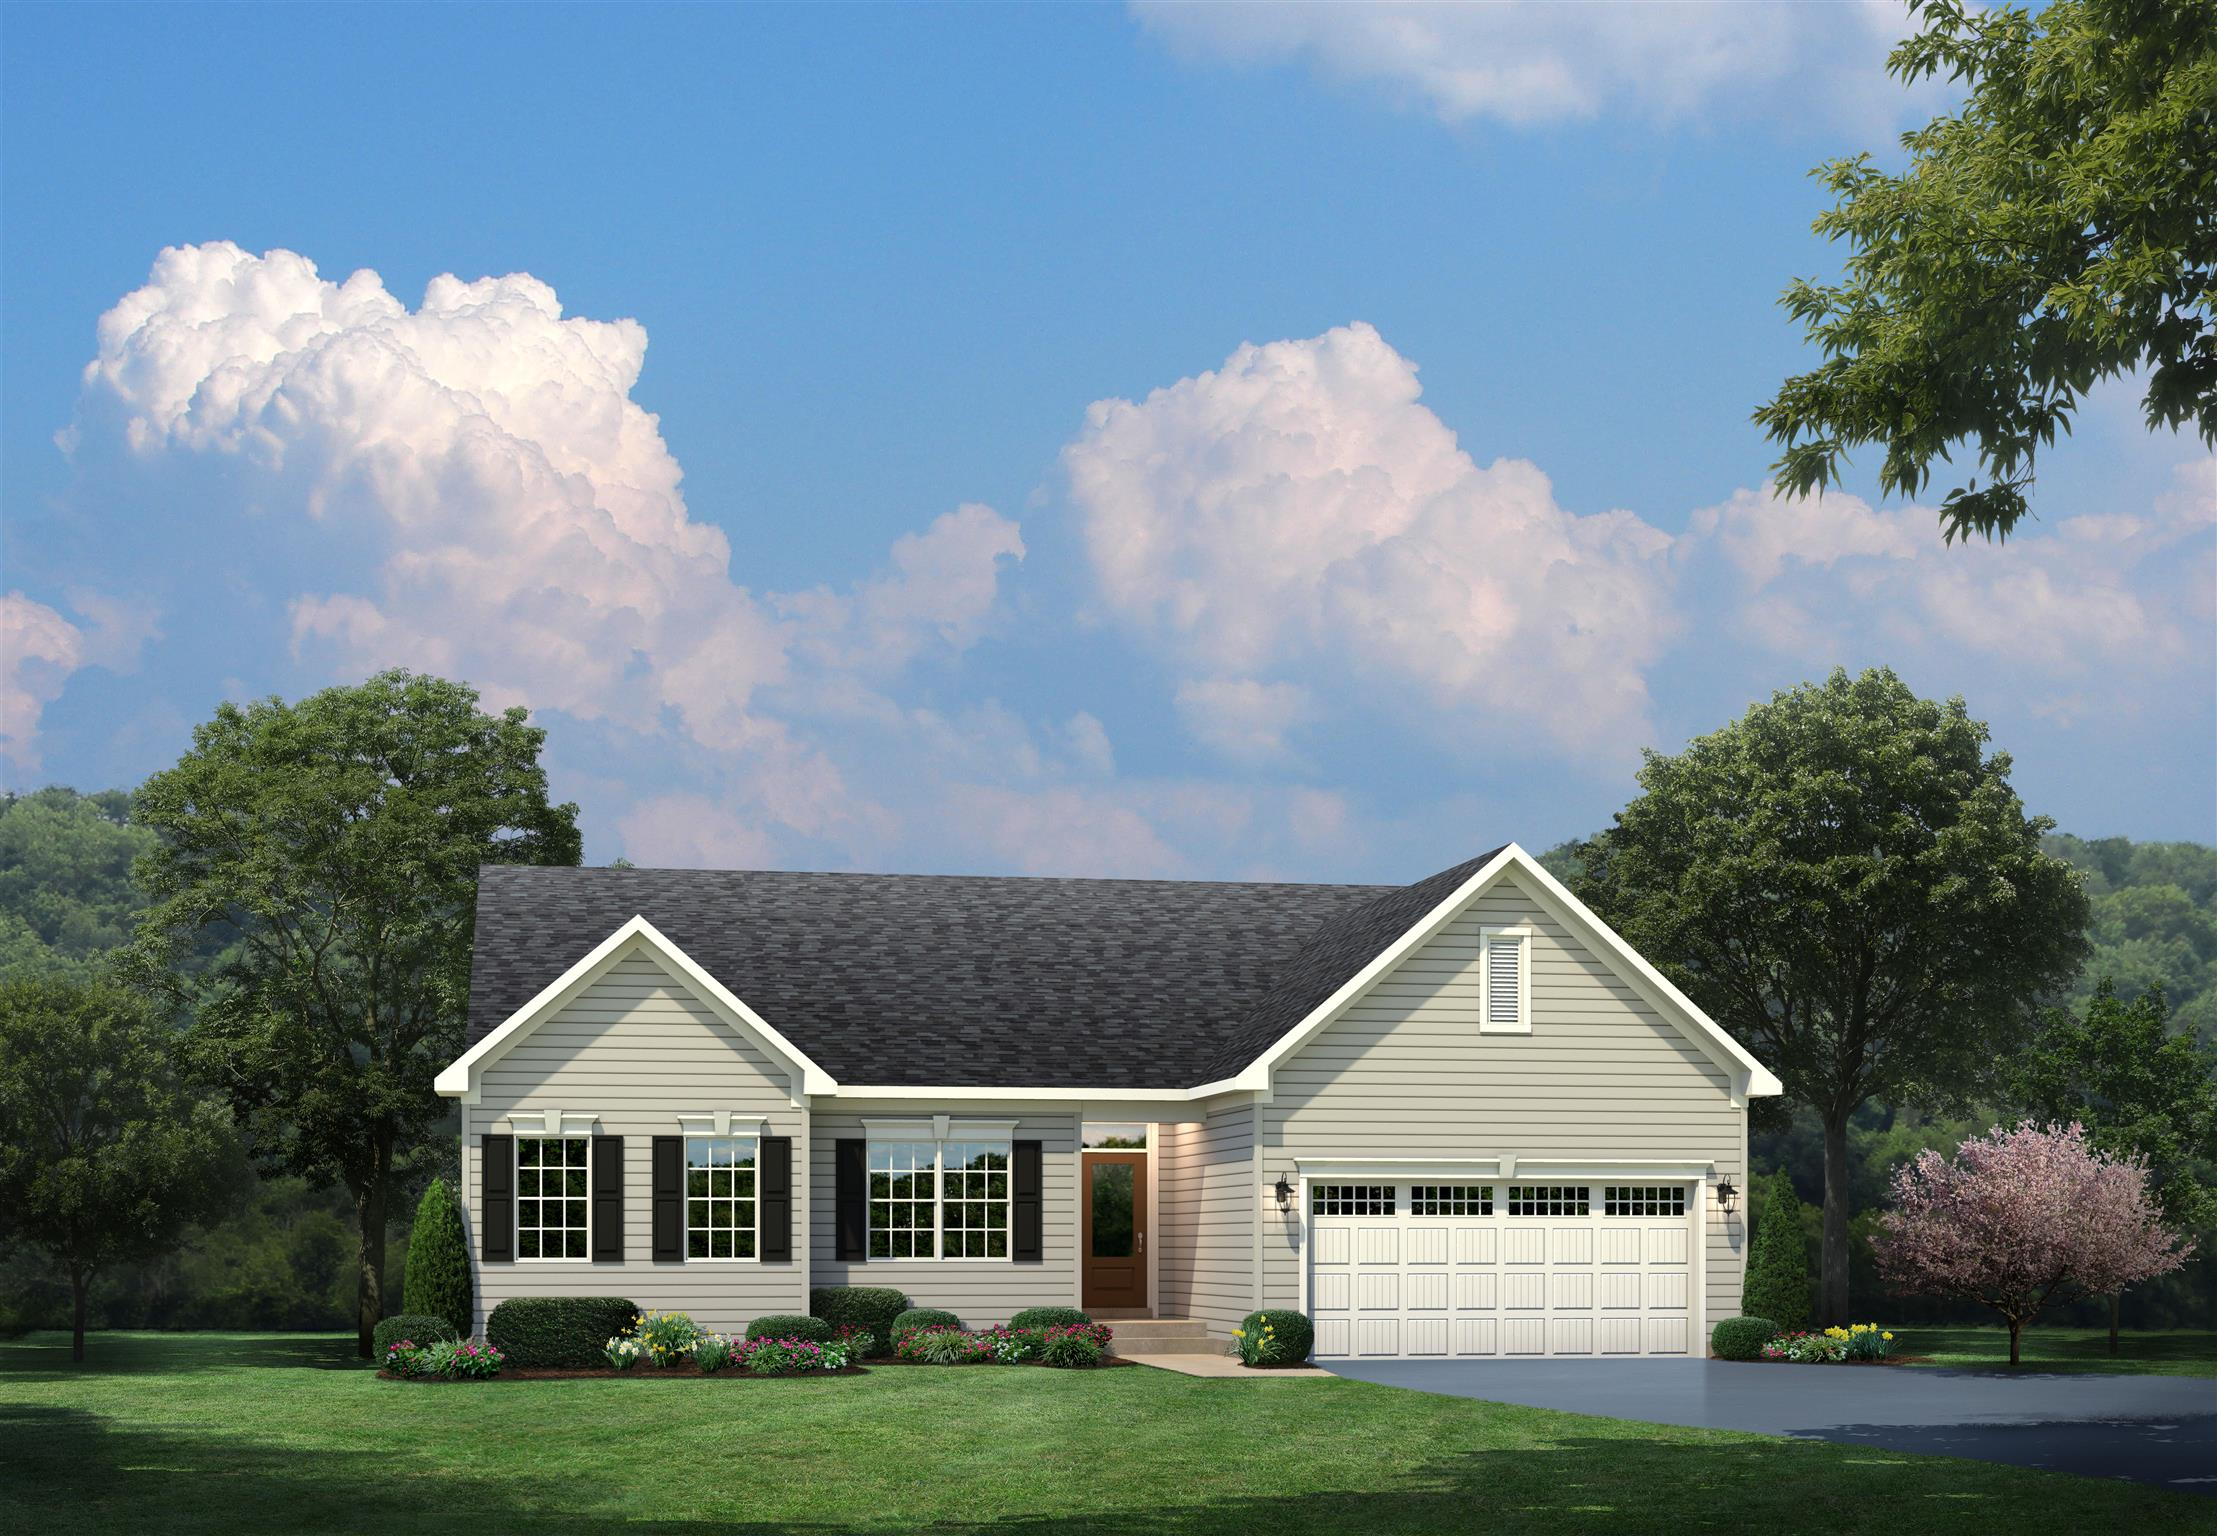 3049 Leatherwood Drive, L384, Murfreesboro, TN 37128 - Murfreesboro, TN real estate listing